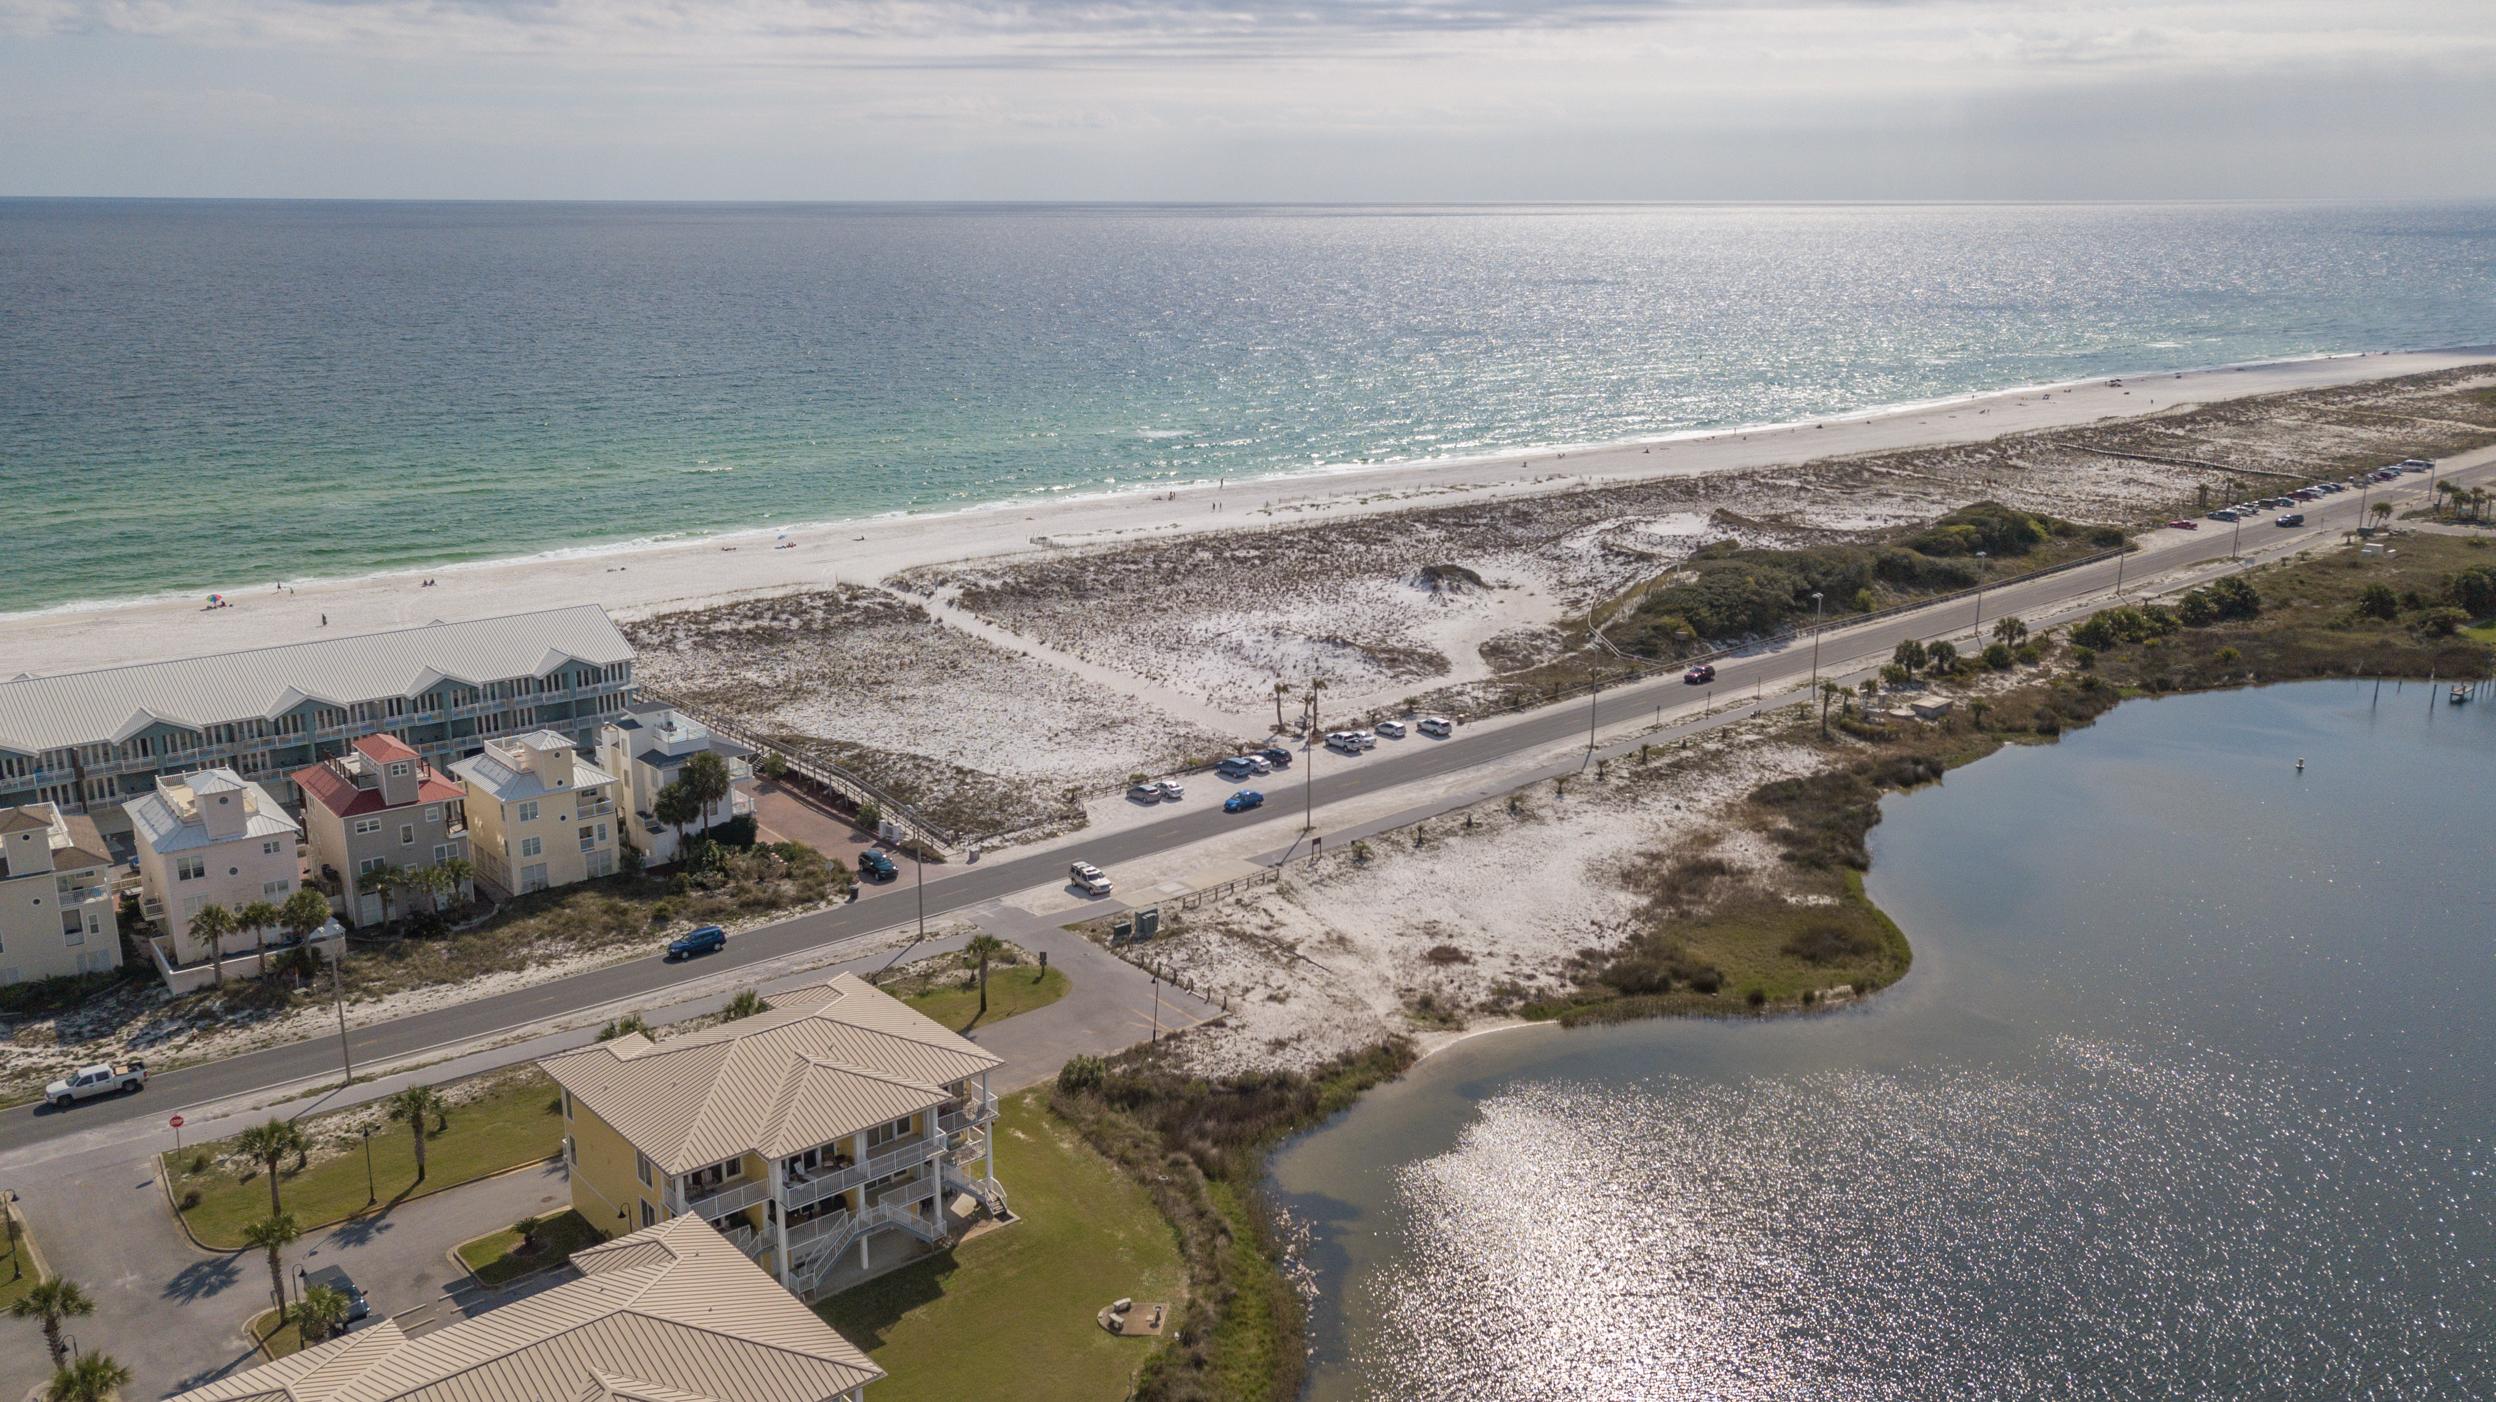 White Sands Cottage 501 Life's a Beach House Townhouse rental in White Sands Pensacola Beach in Pensacola Beach Florida - #55